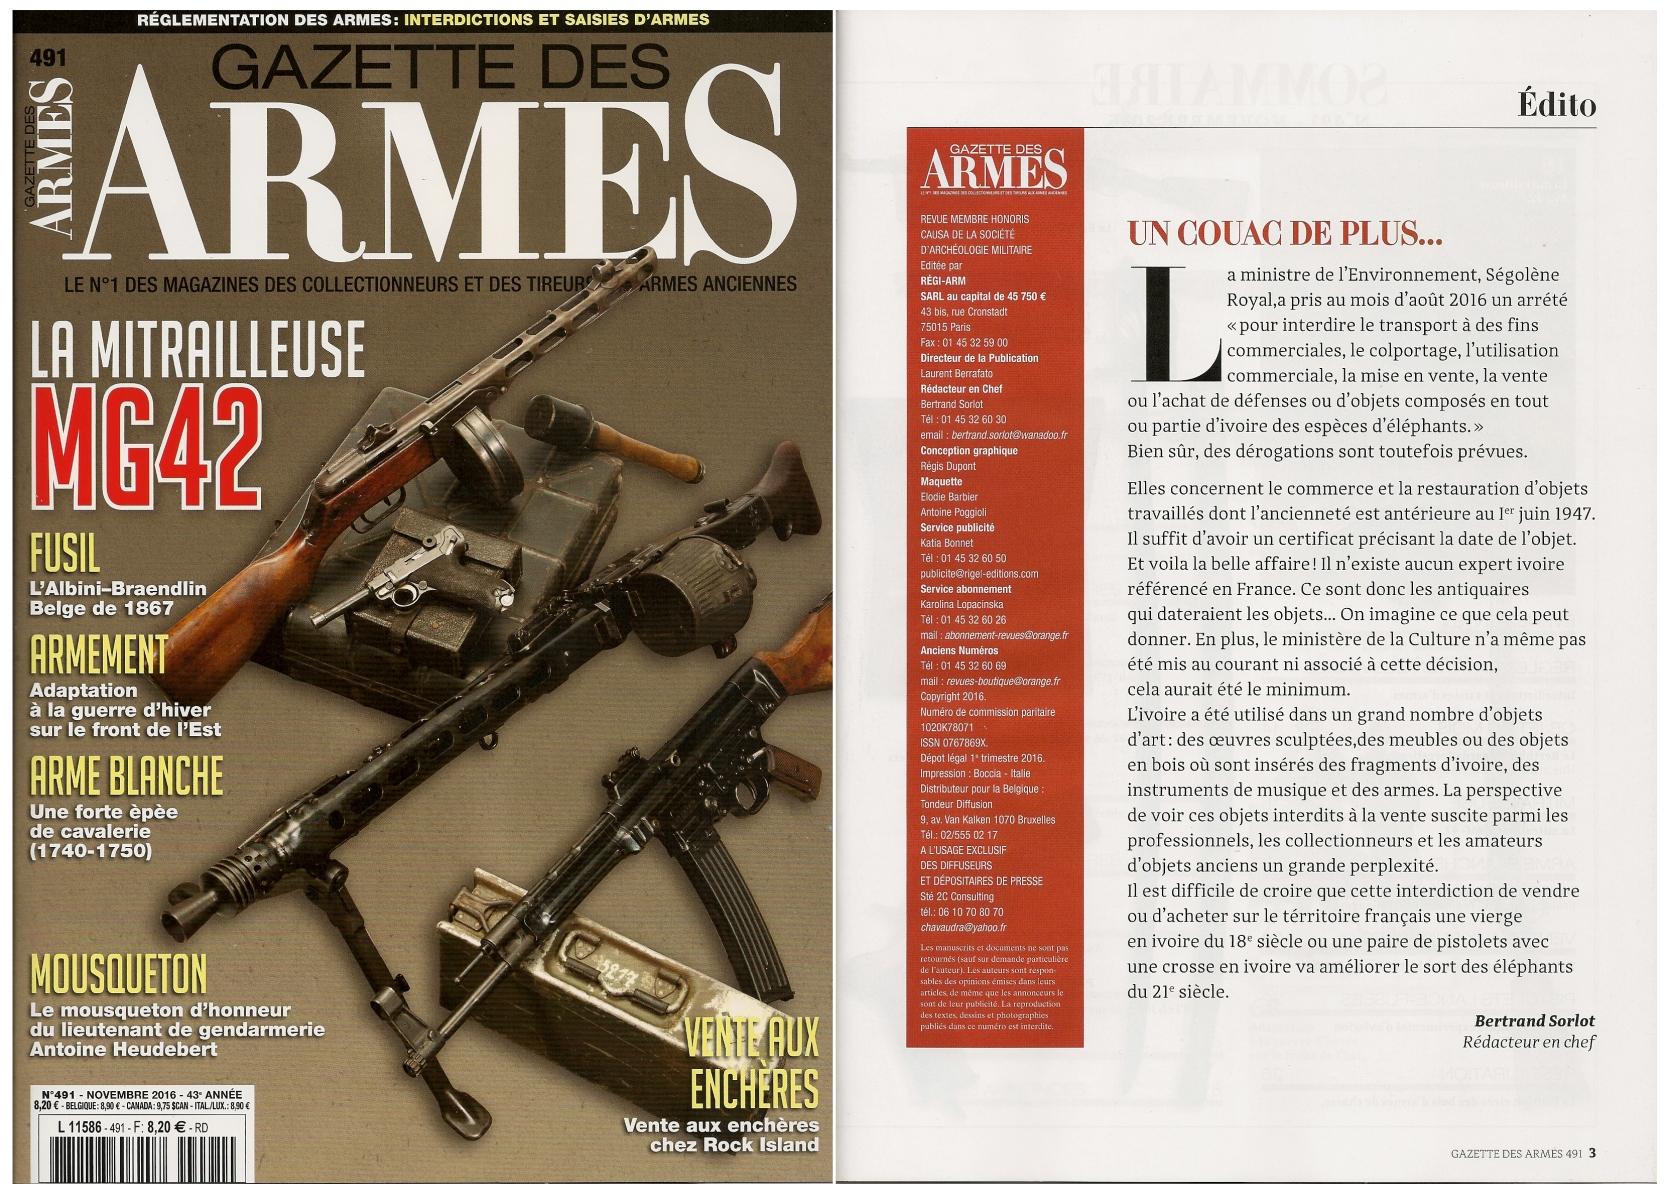 gazette-n491-edito_petite